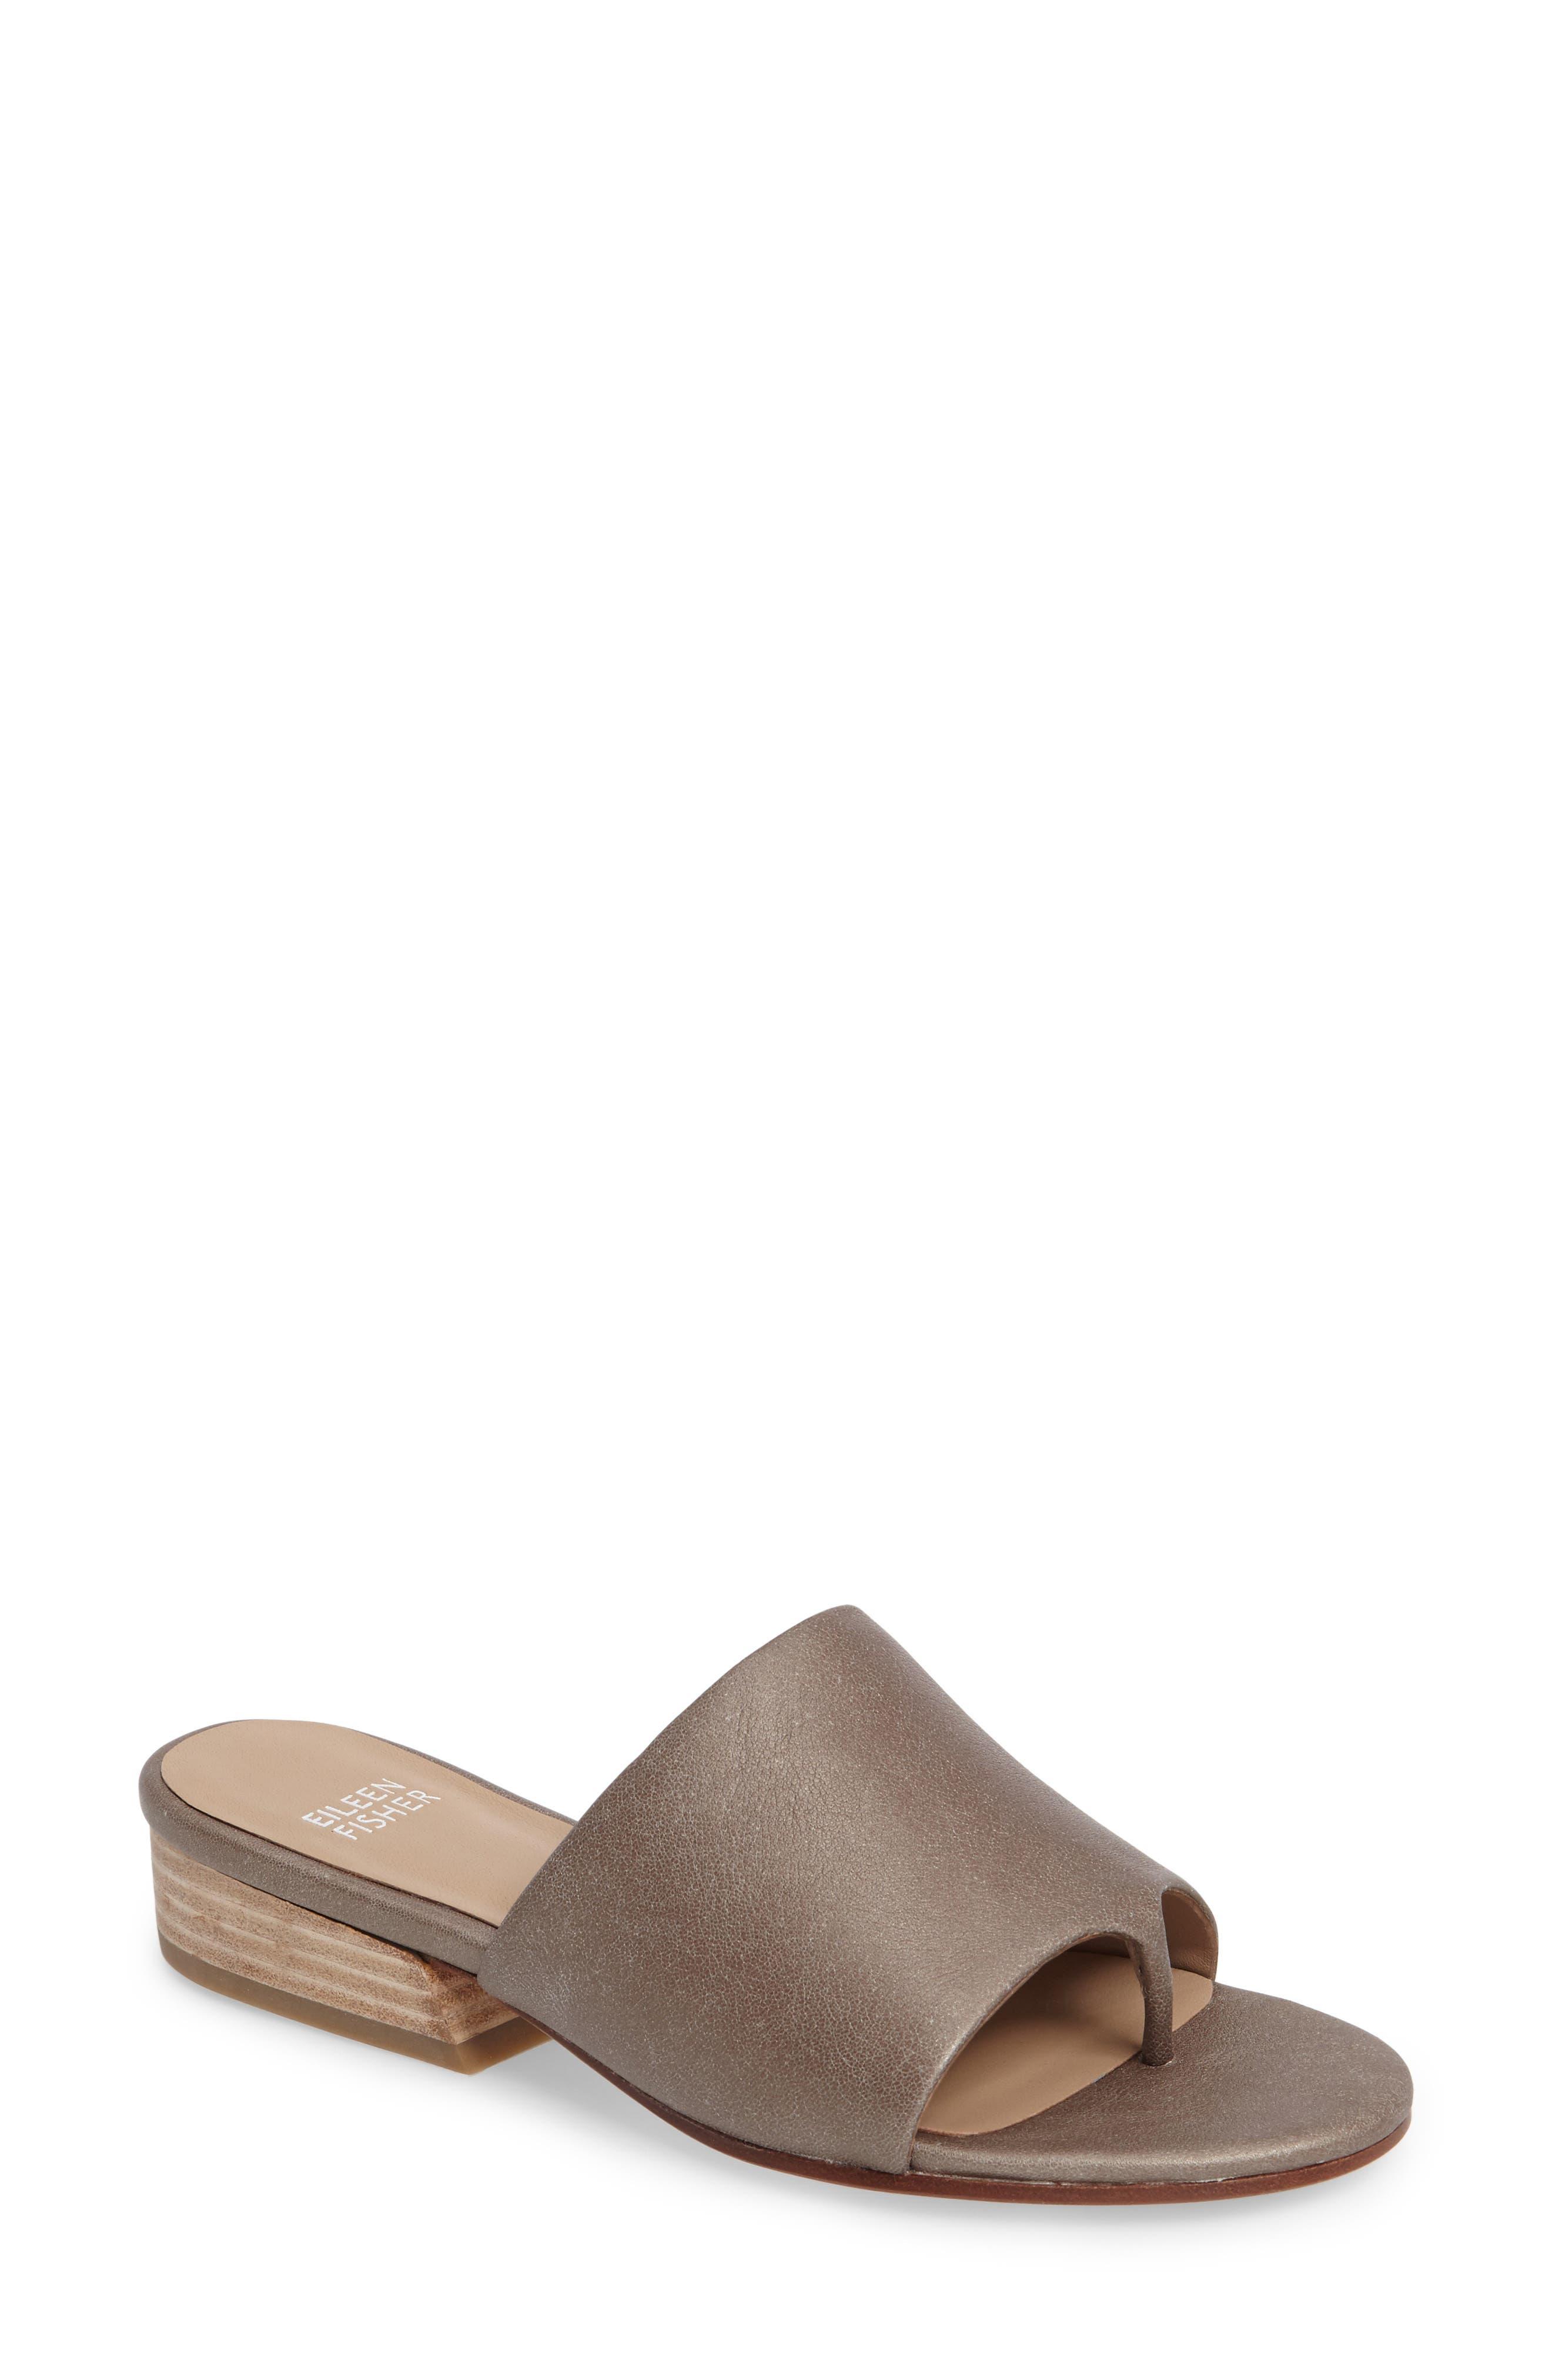 Beal Slide Sandal,                         Main,                         color, Pyrite Leather